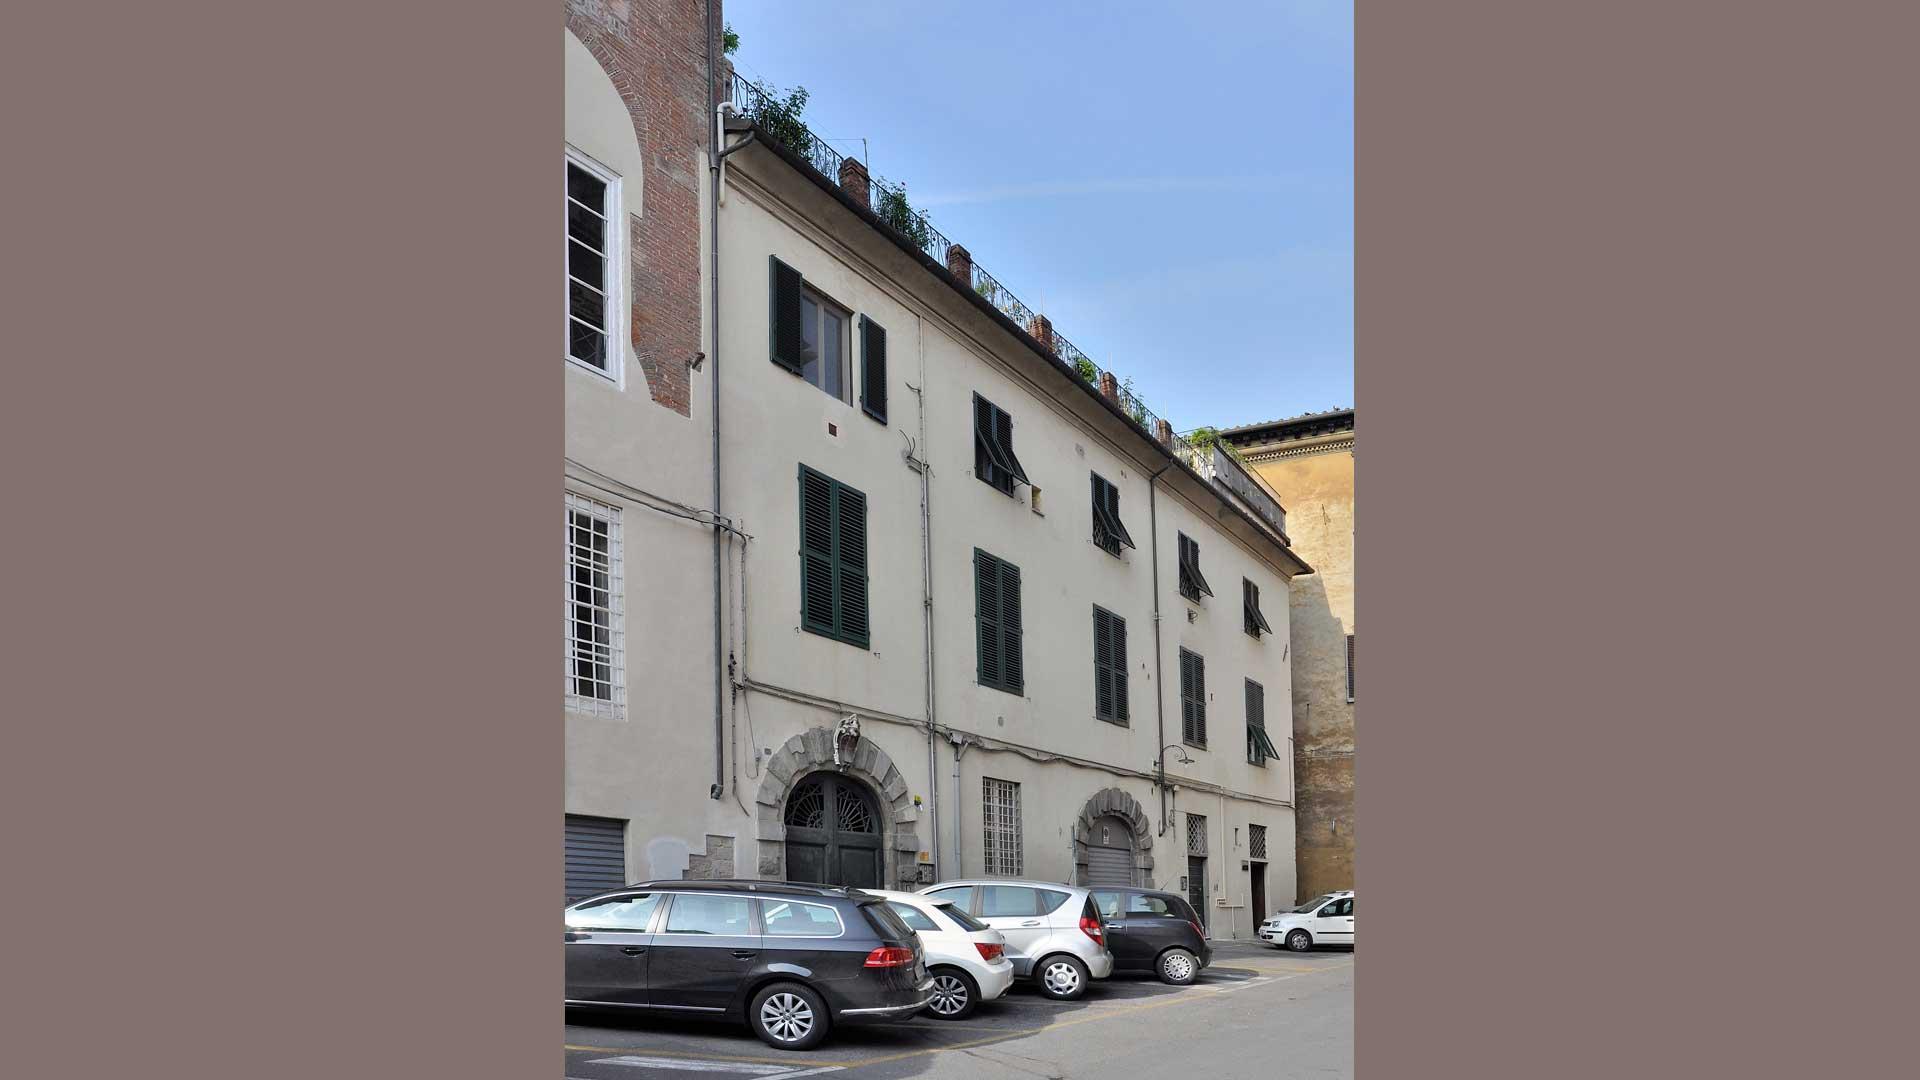 Palazzo Burlamacchi